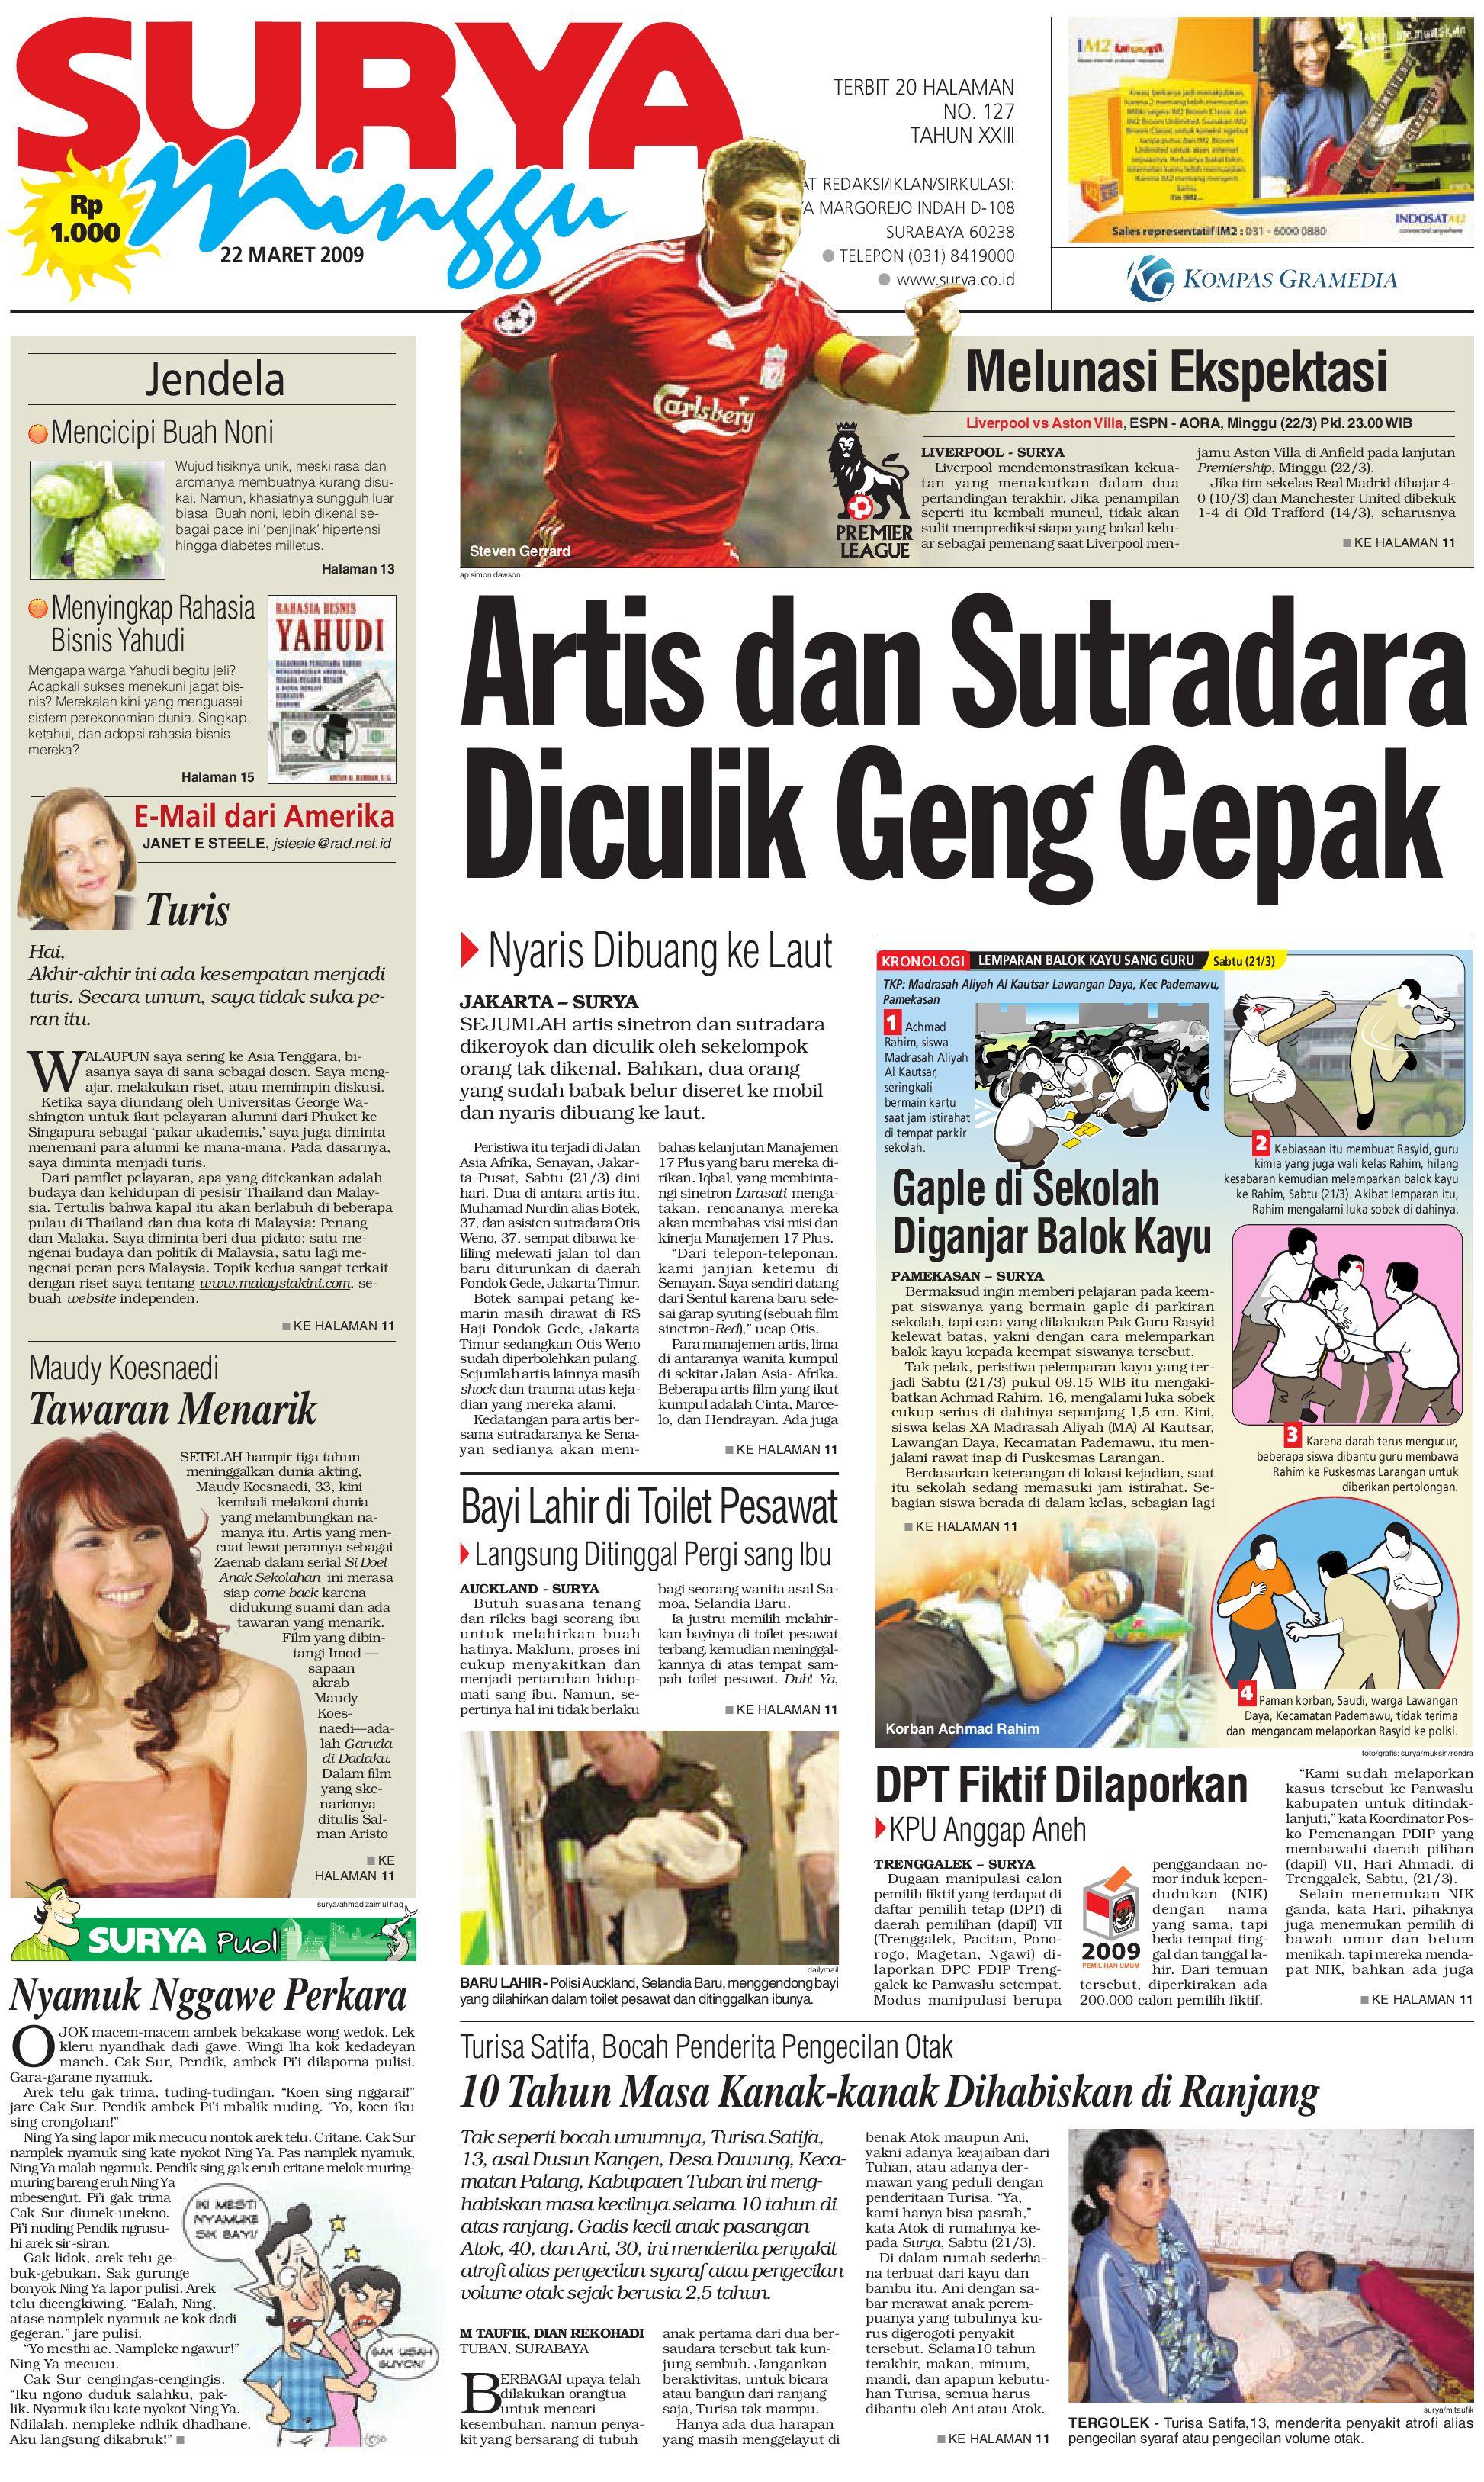 Surya Edisi Cetak 22 Maret 2009 by Harian SURYA - issuu e4d9740938